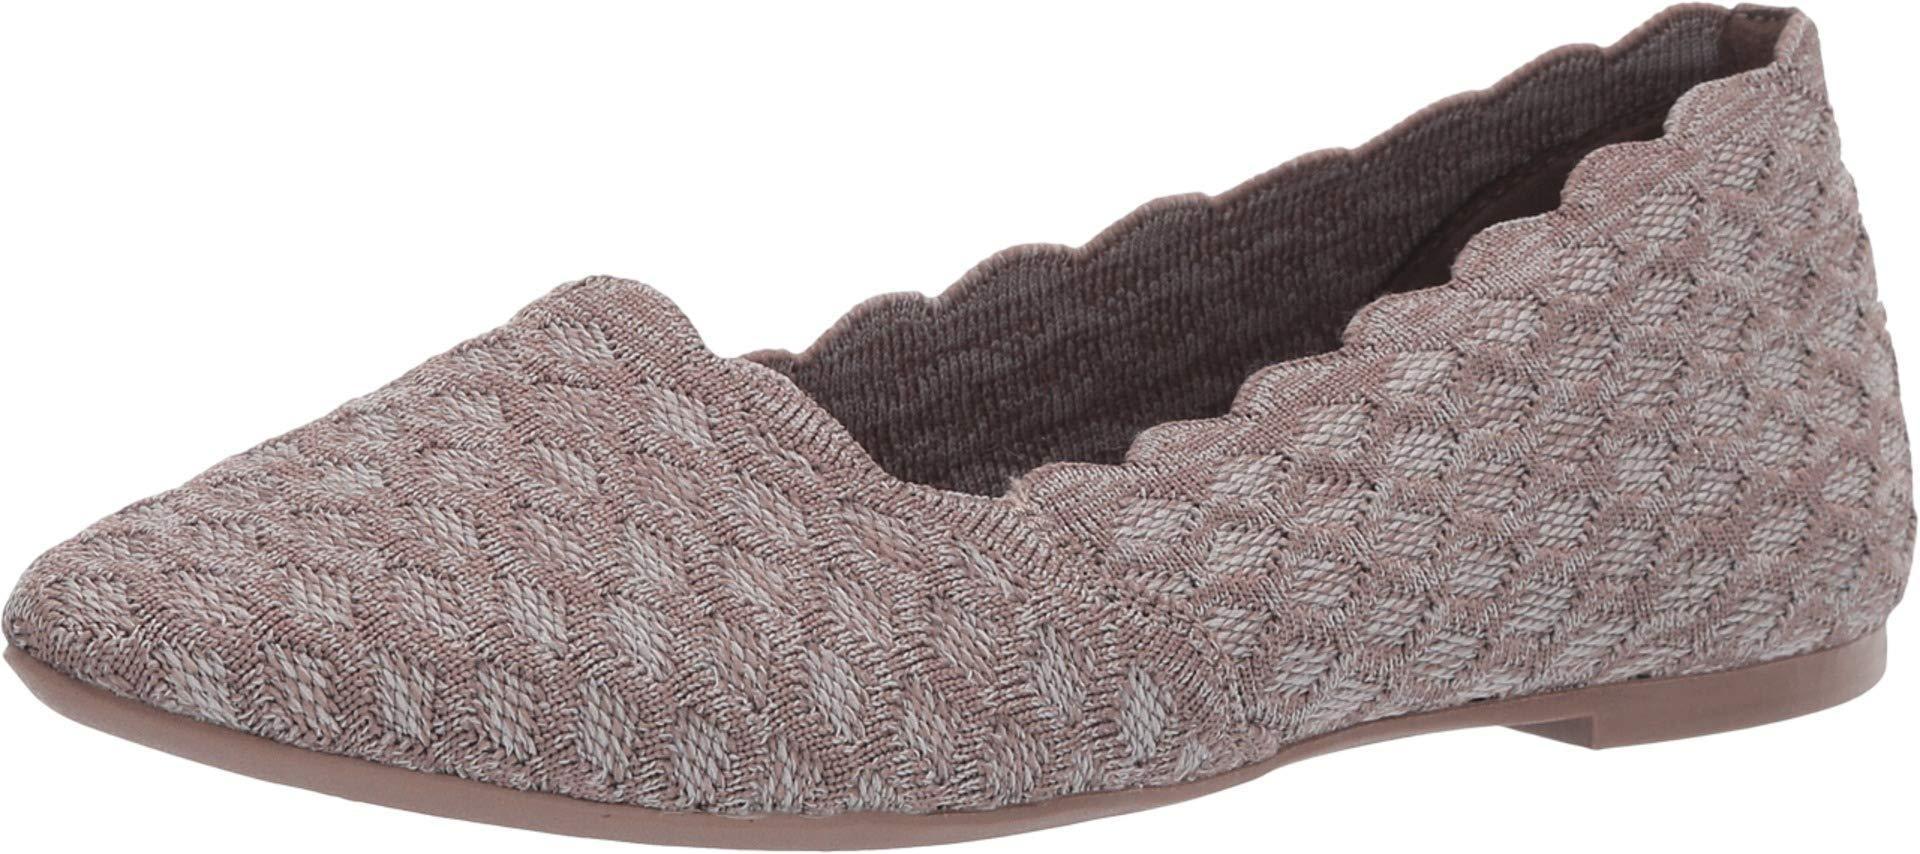 Cleo-scalloped Knit Skimmer Ballet Flat